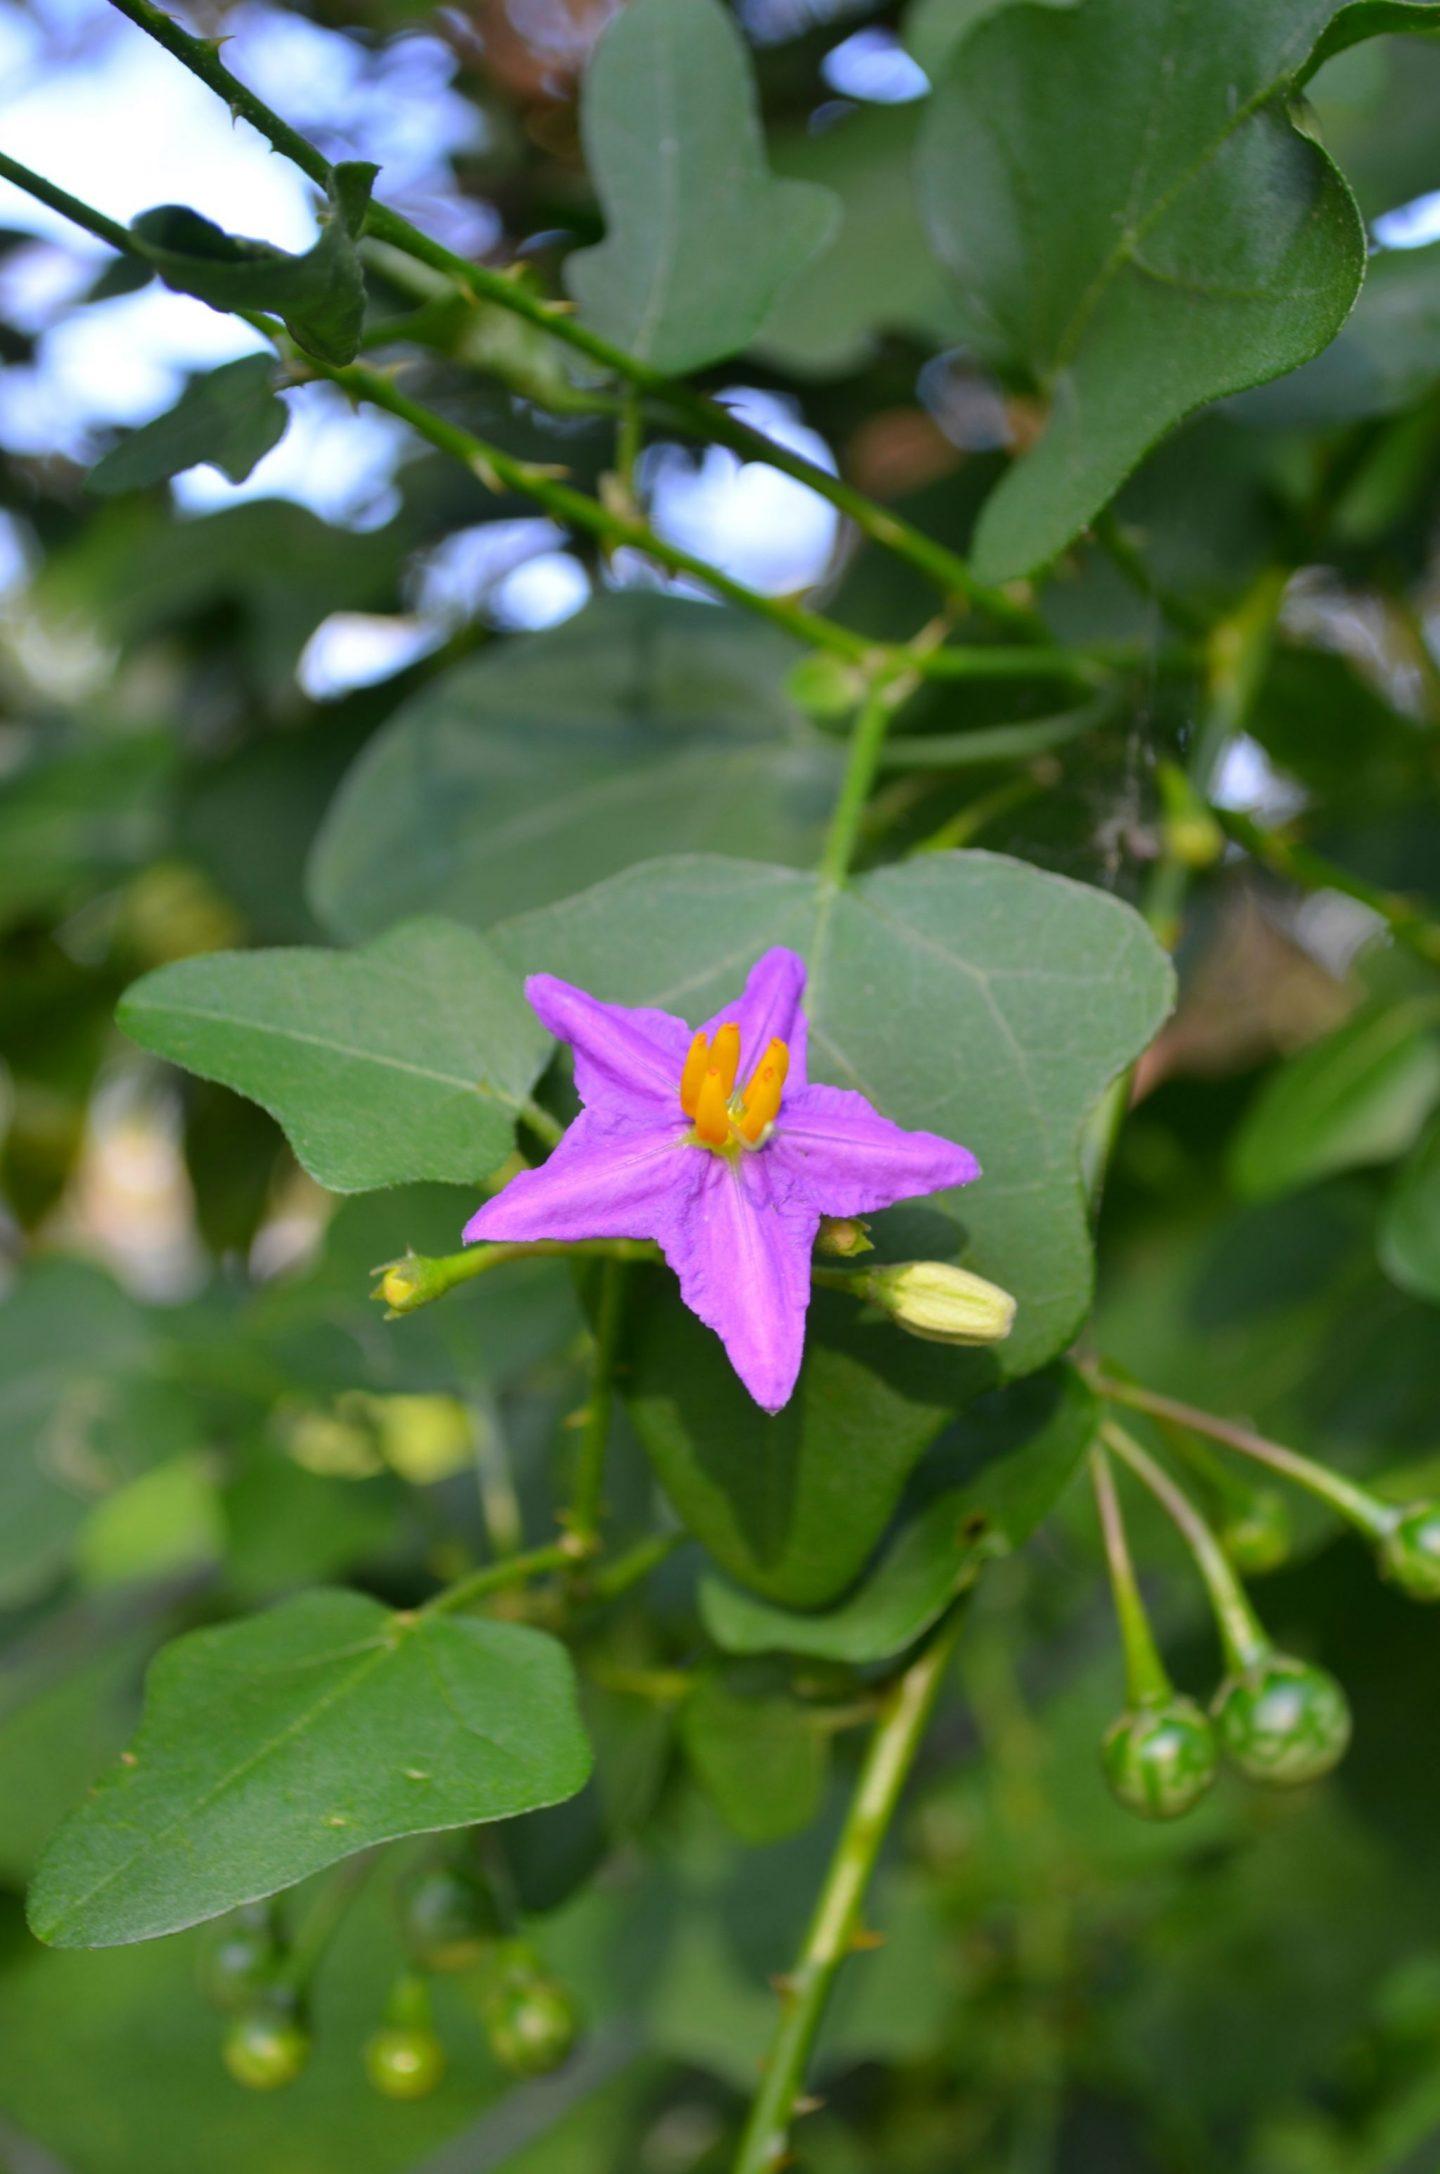 Thuthuvalai Keerai health benefits